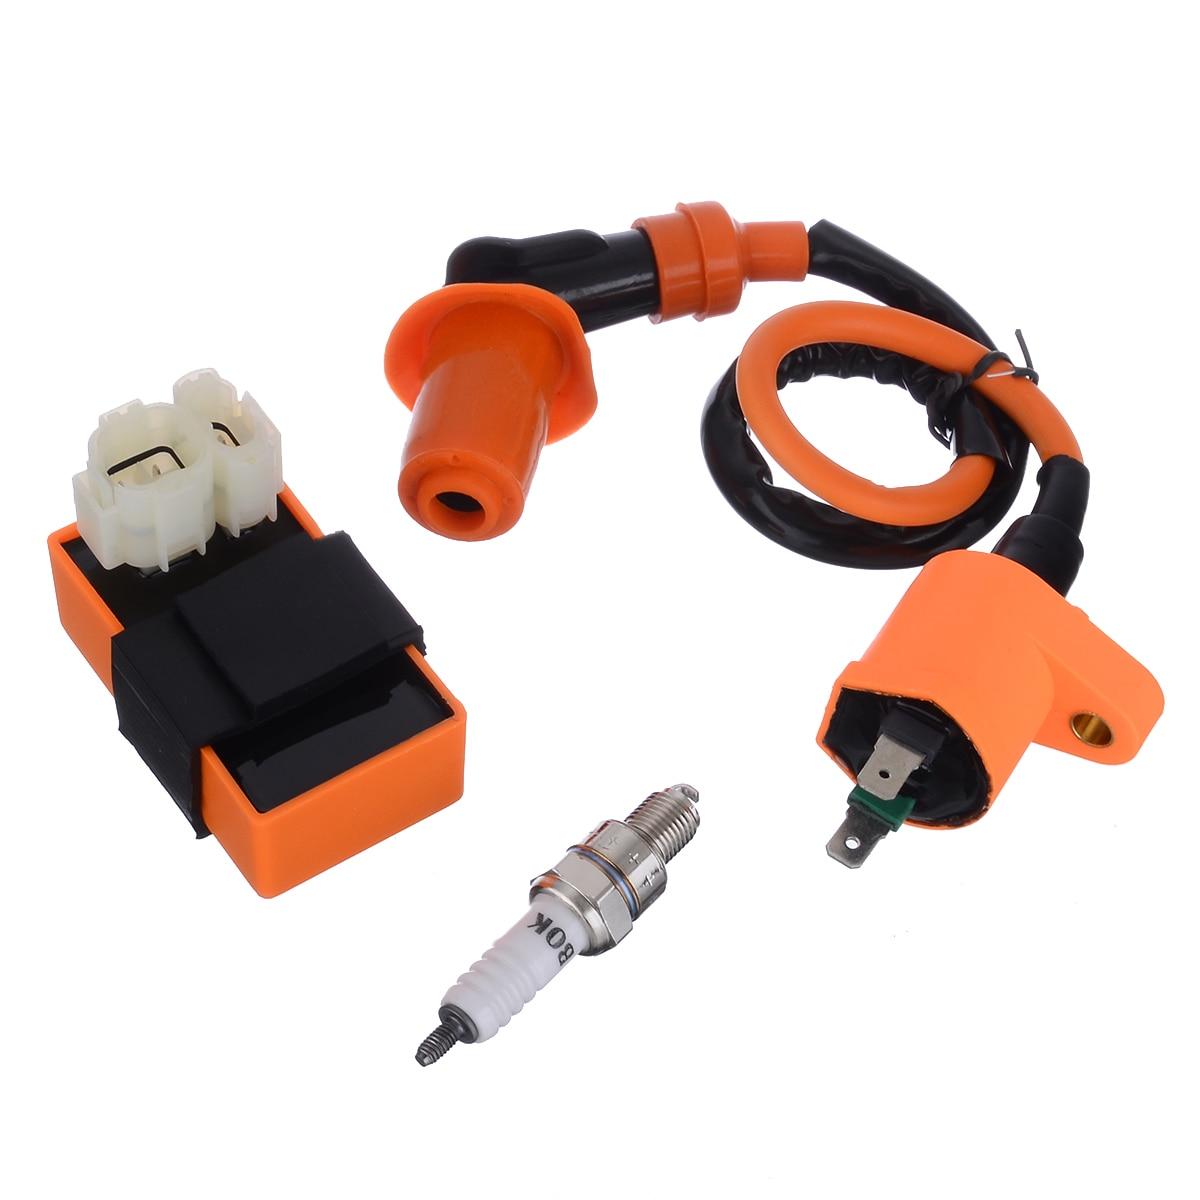 1set Motorbike Ingition Racing CDI + Spark Plug + Ignition Coil Kits For GY6 50/125/150CC 4-stroke ATV Scooter Dirt Bike Go Kart